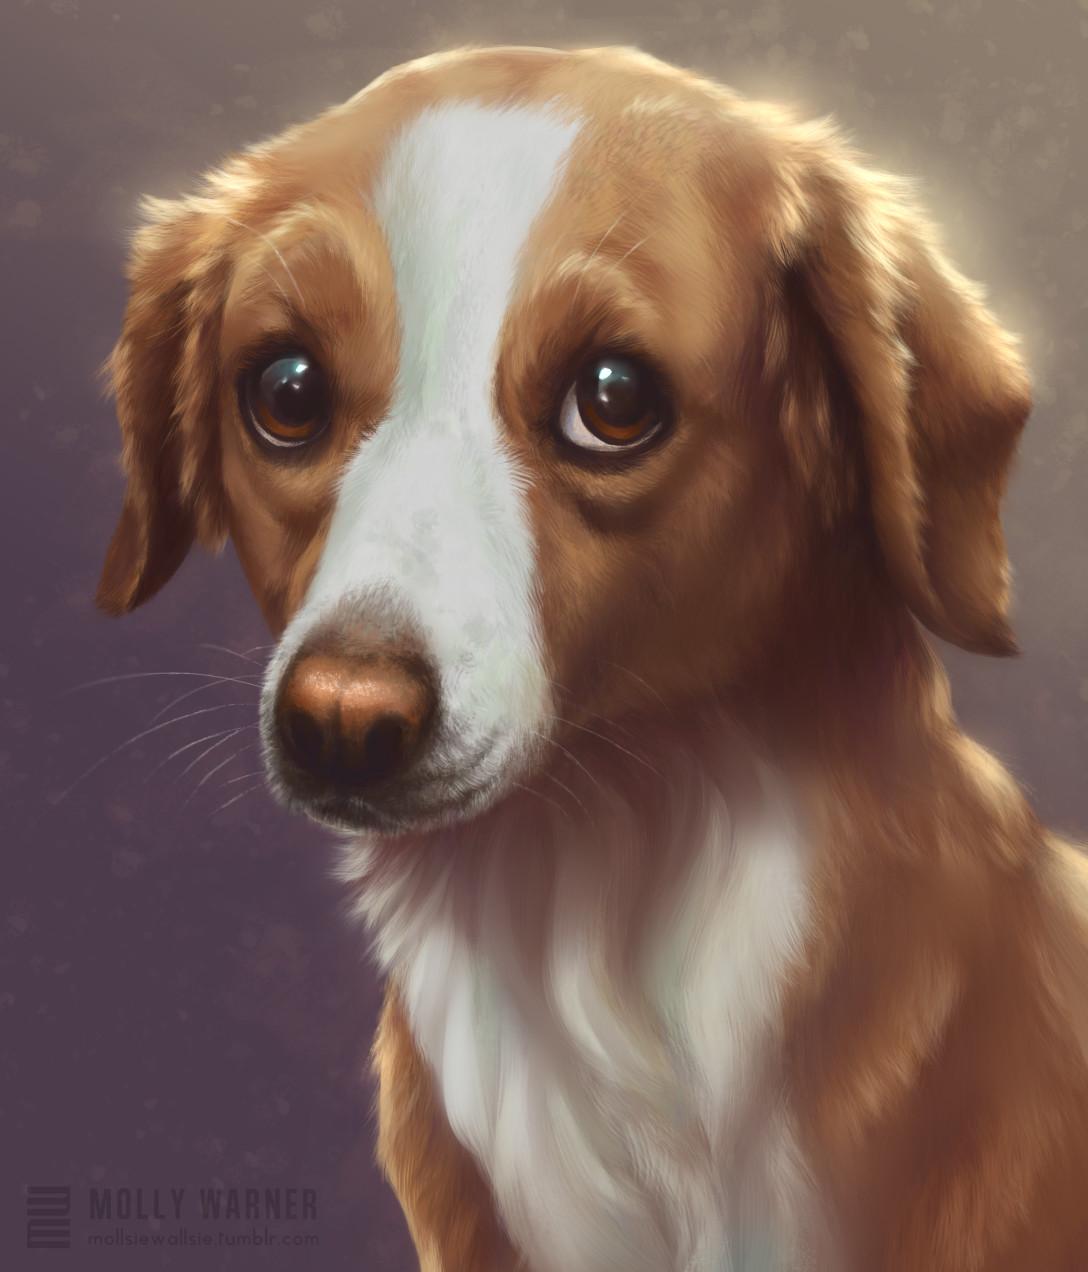 Molly warner sadie portrait final